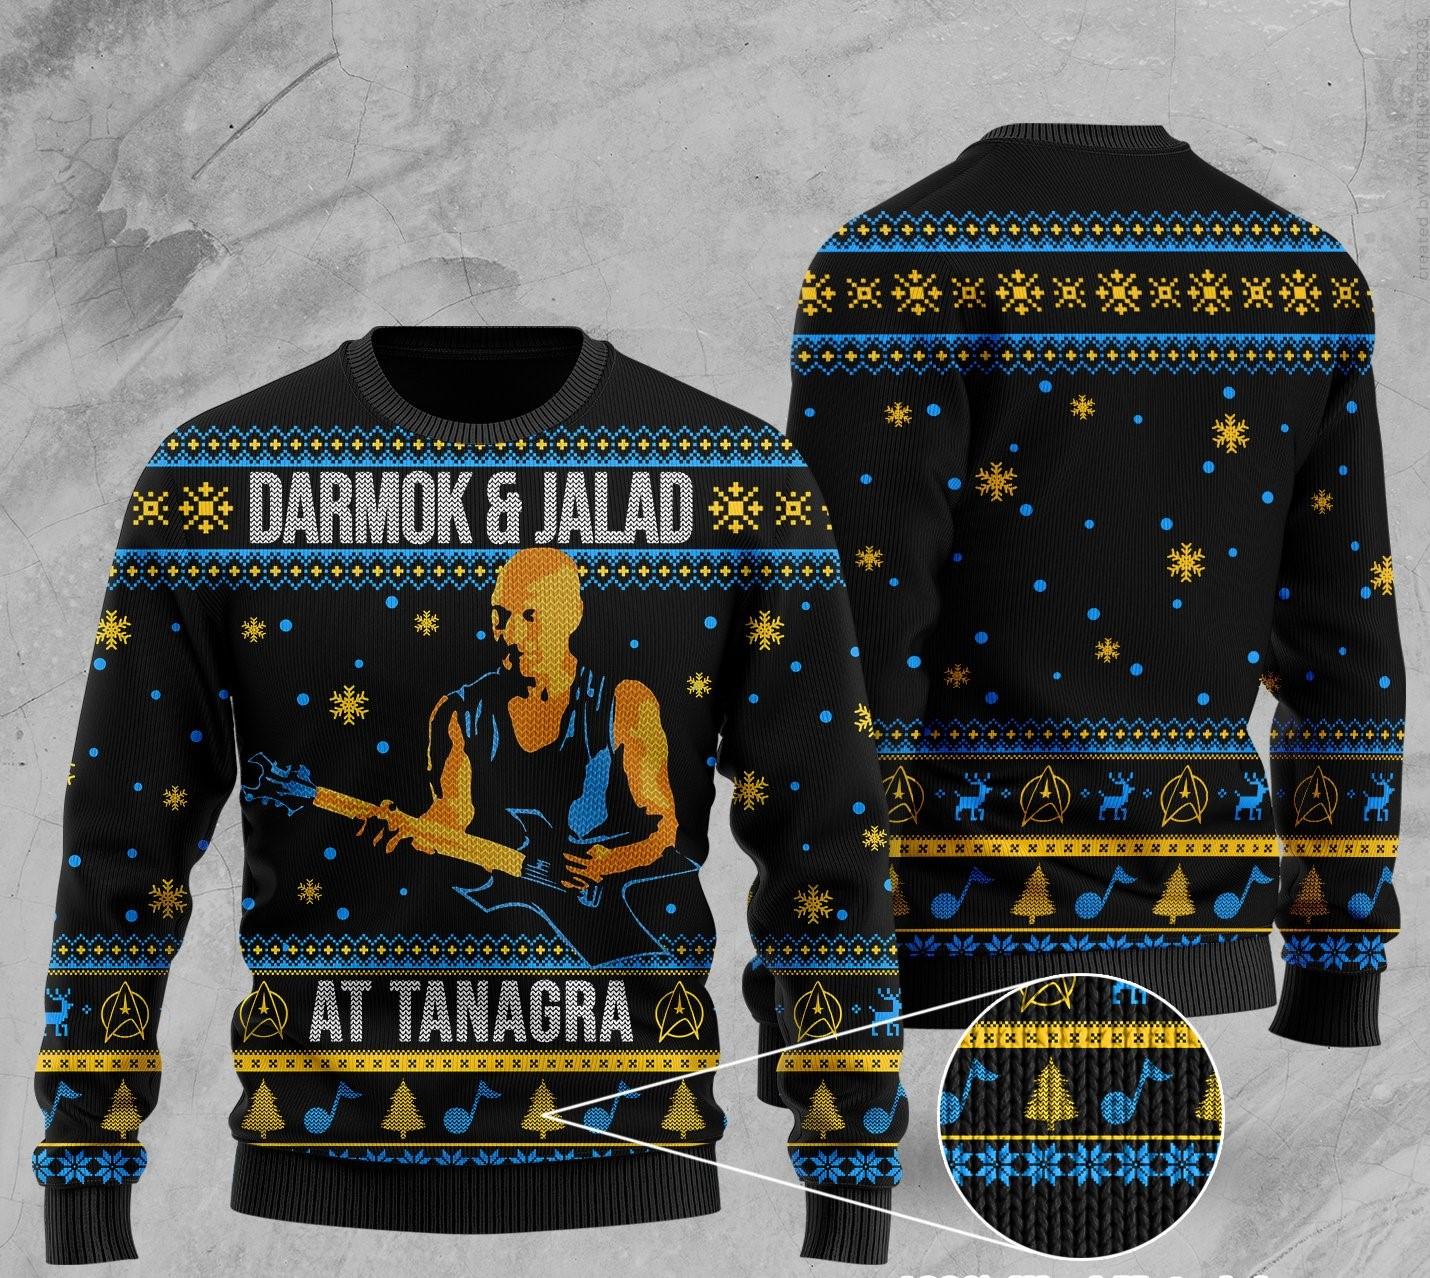 darmok and jalad at tanagra all over printed ugly christmas sweater 1